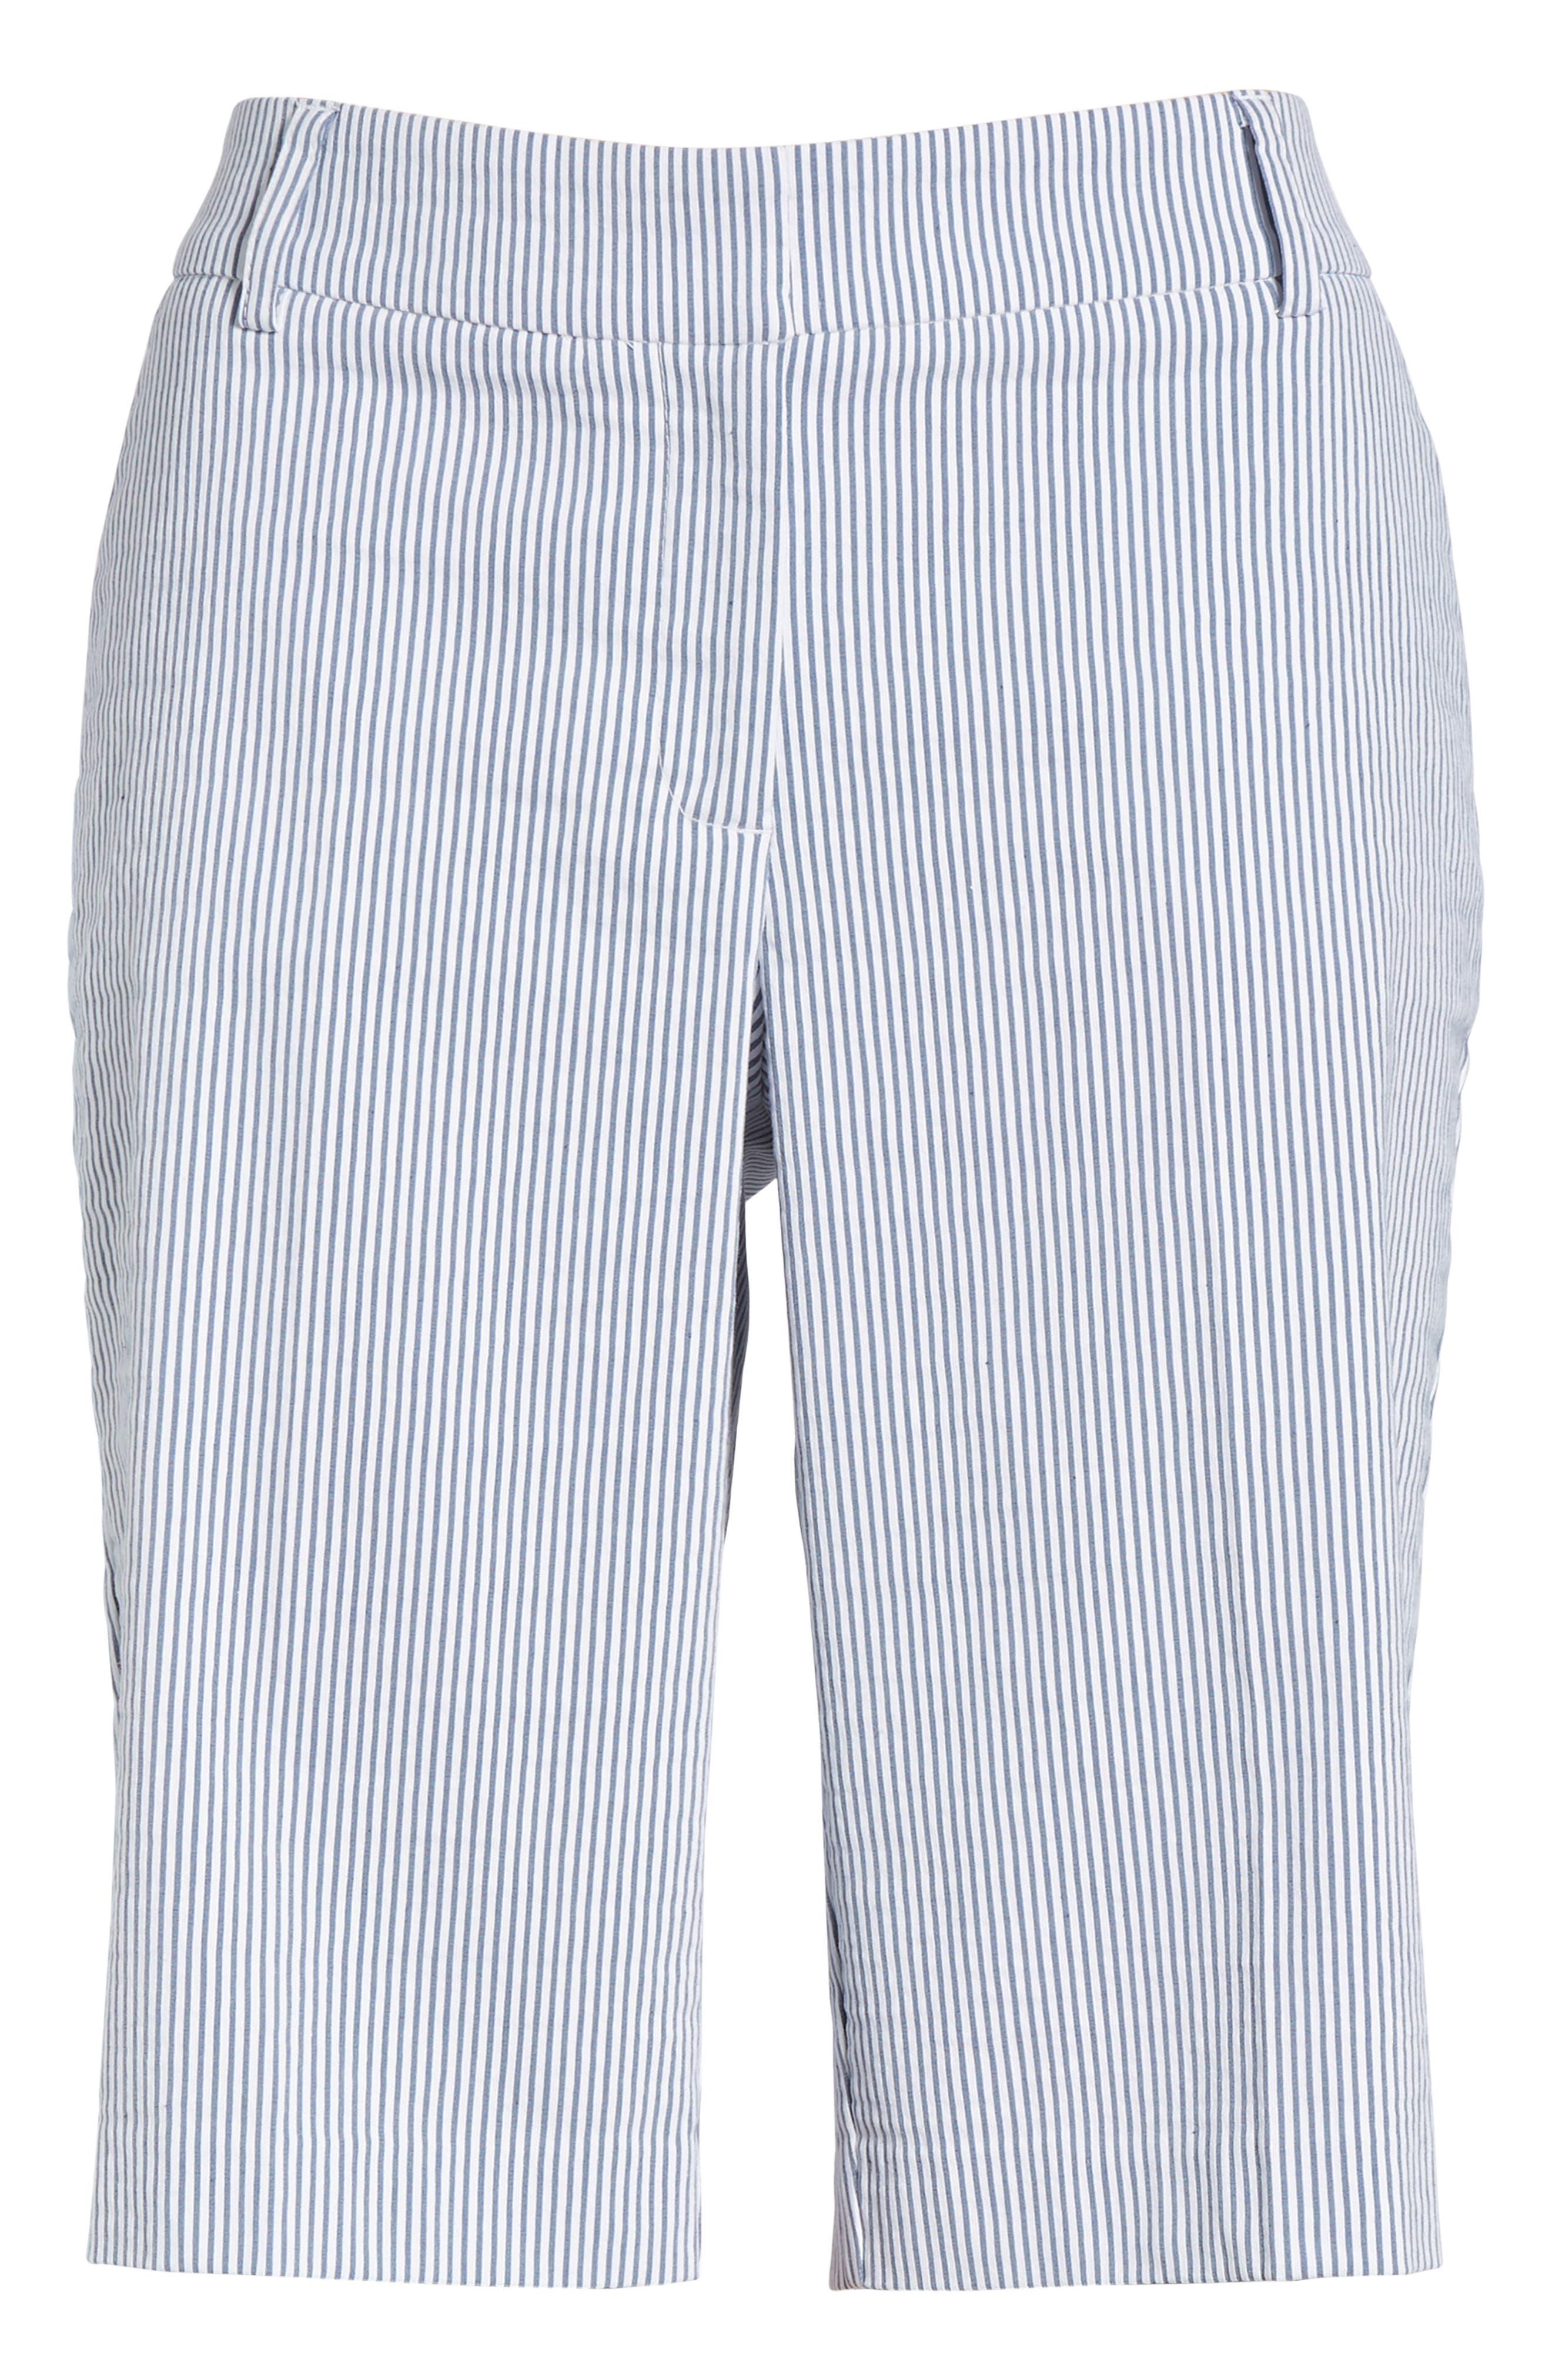 Stretch Bermuda Shorts,                             Alternate thumbnail 6, color,                             Blue- White Seersucker